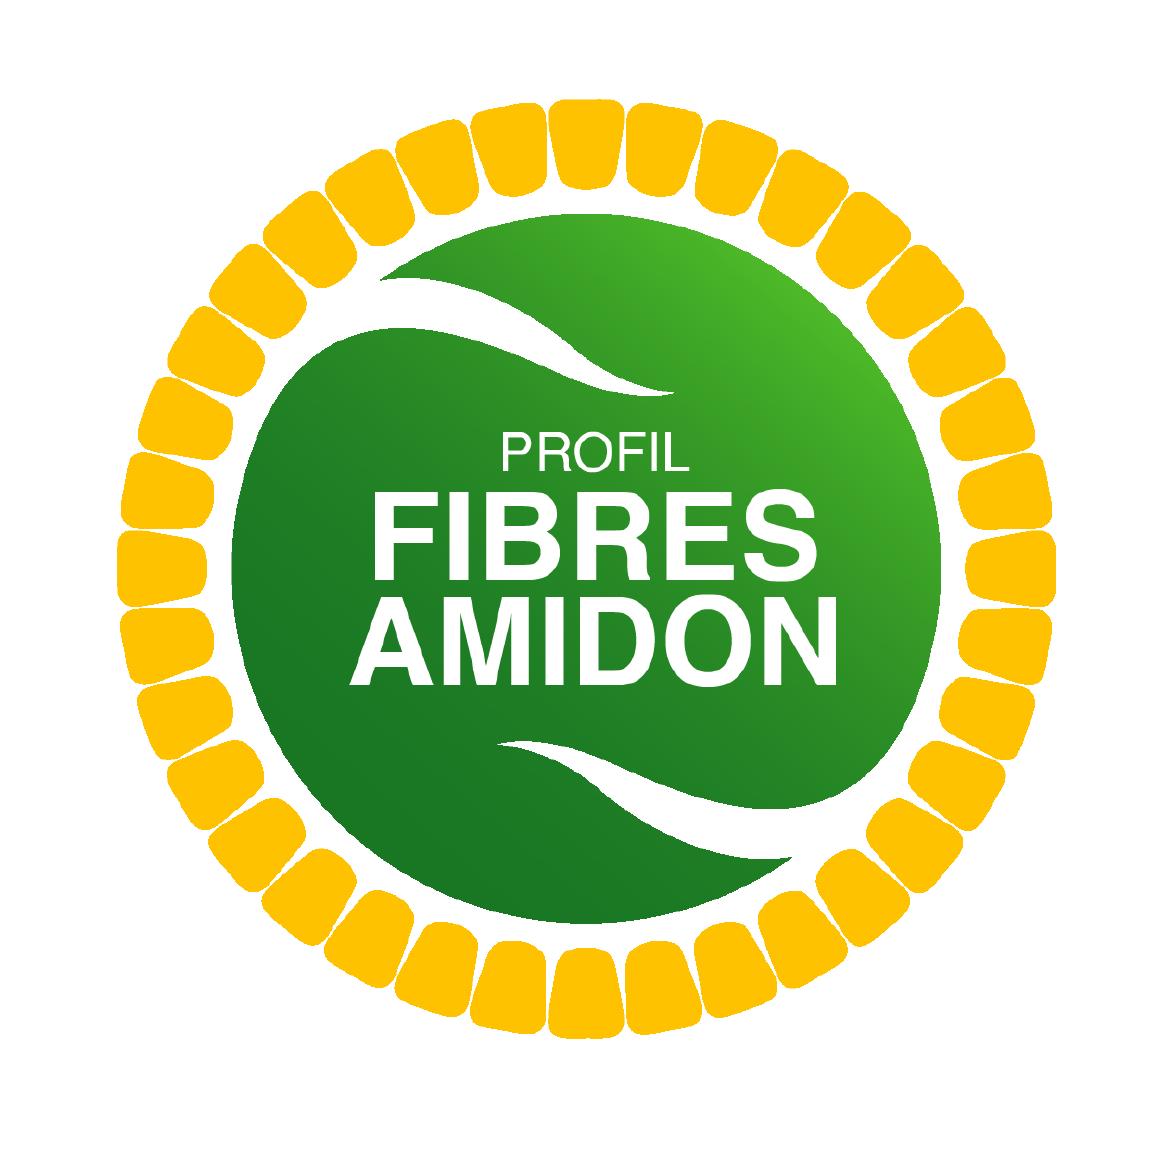 picto Logo_Profil_Fibres_Amidon-01.png